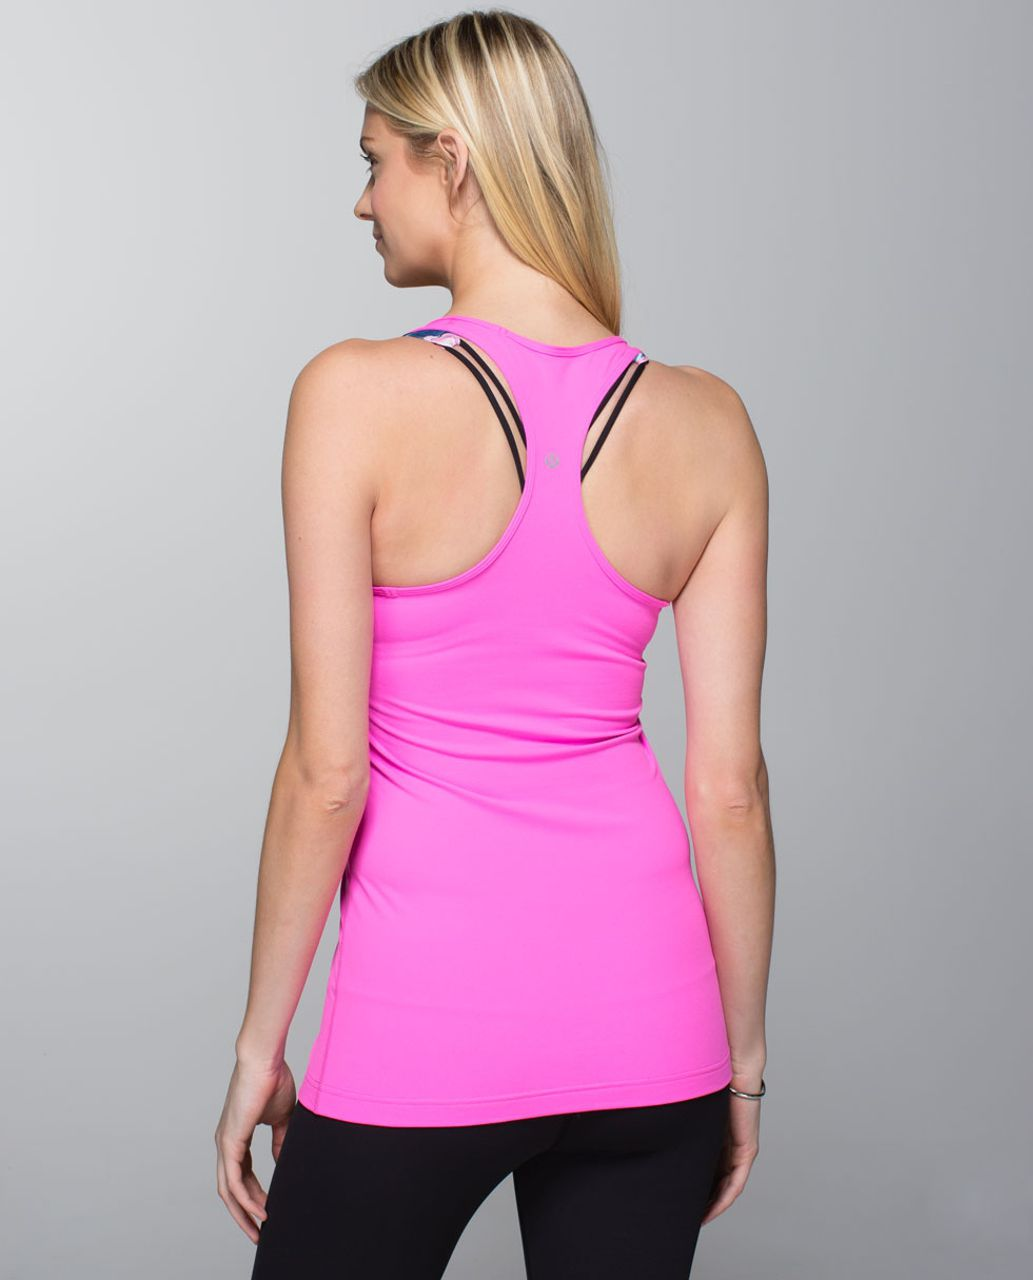 Lululemon Cool Racerback - Pow Pink Light